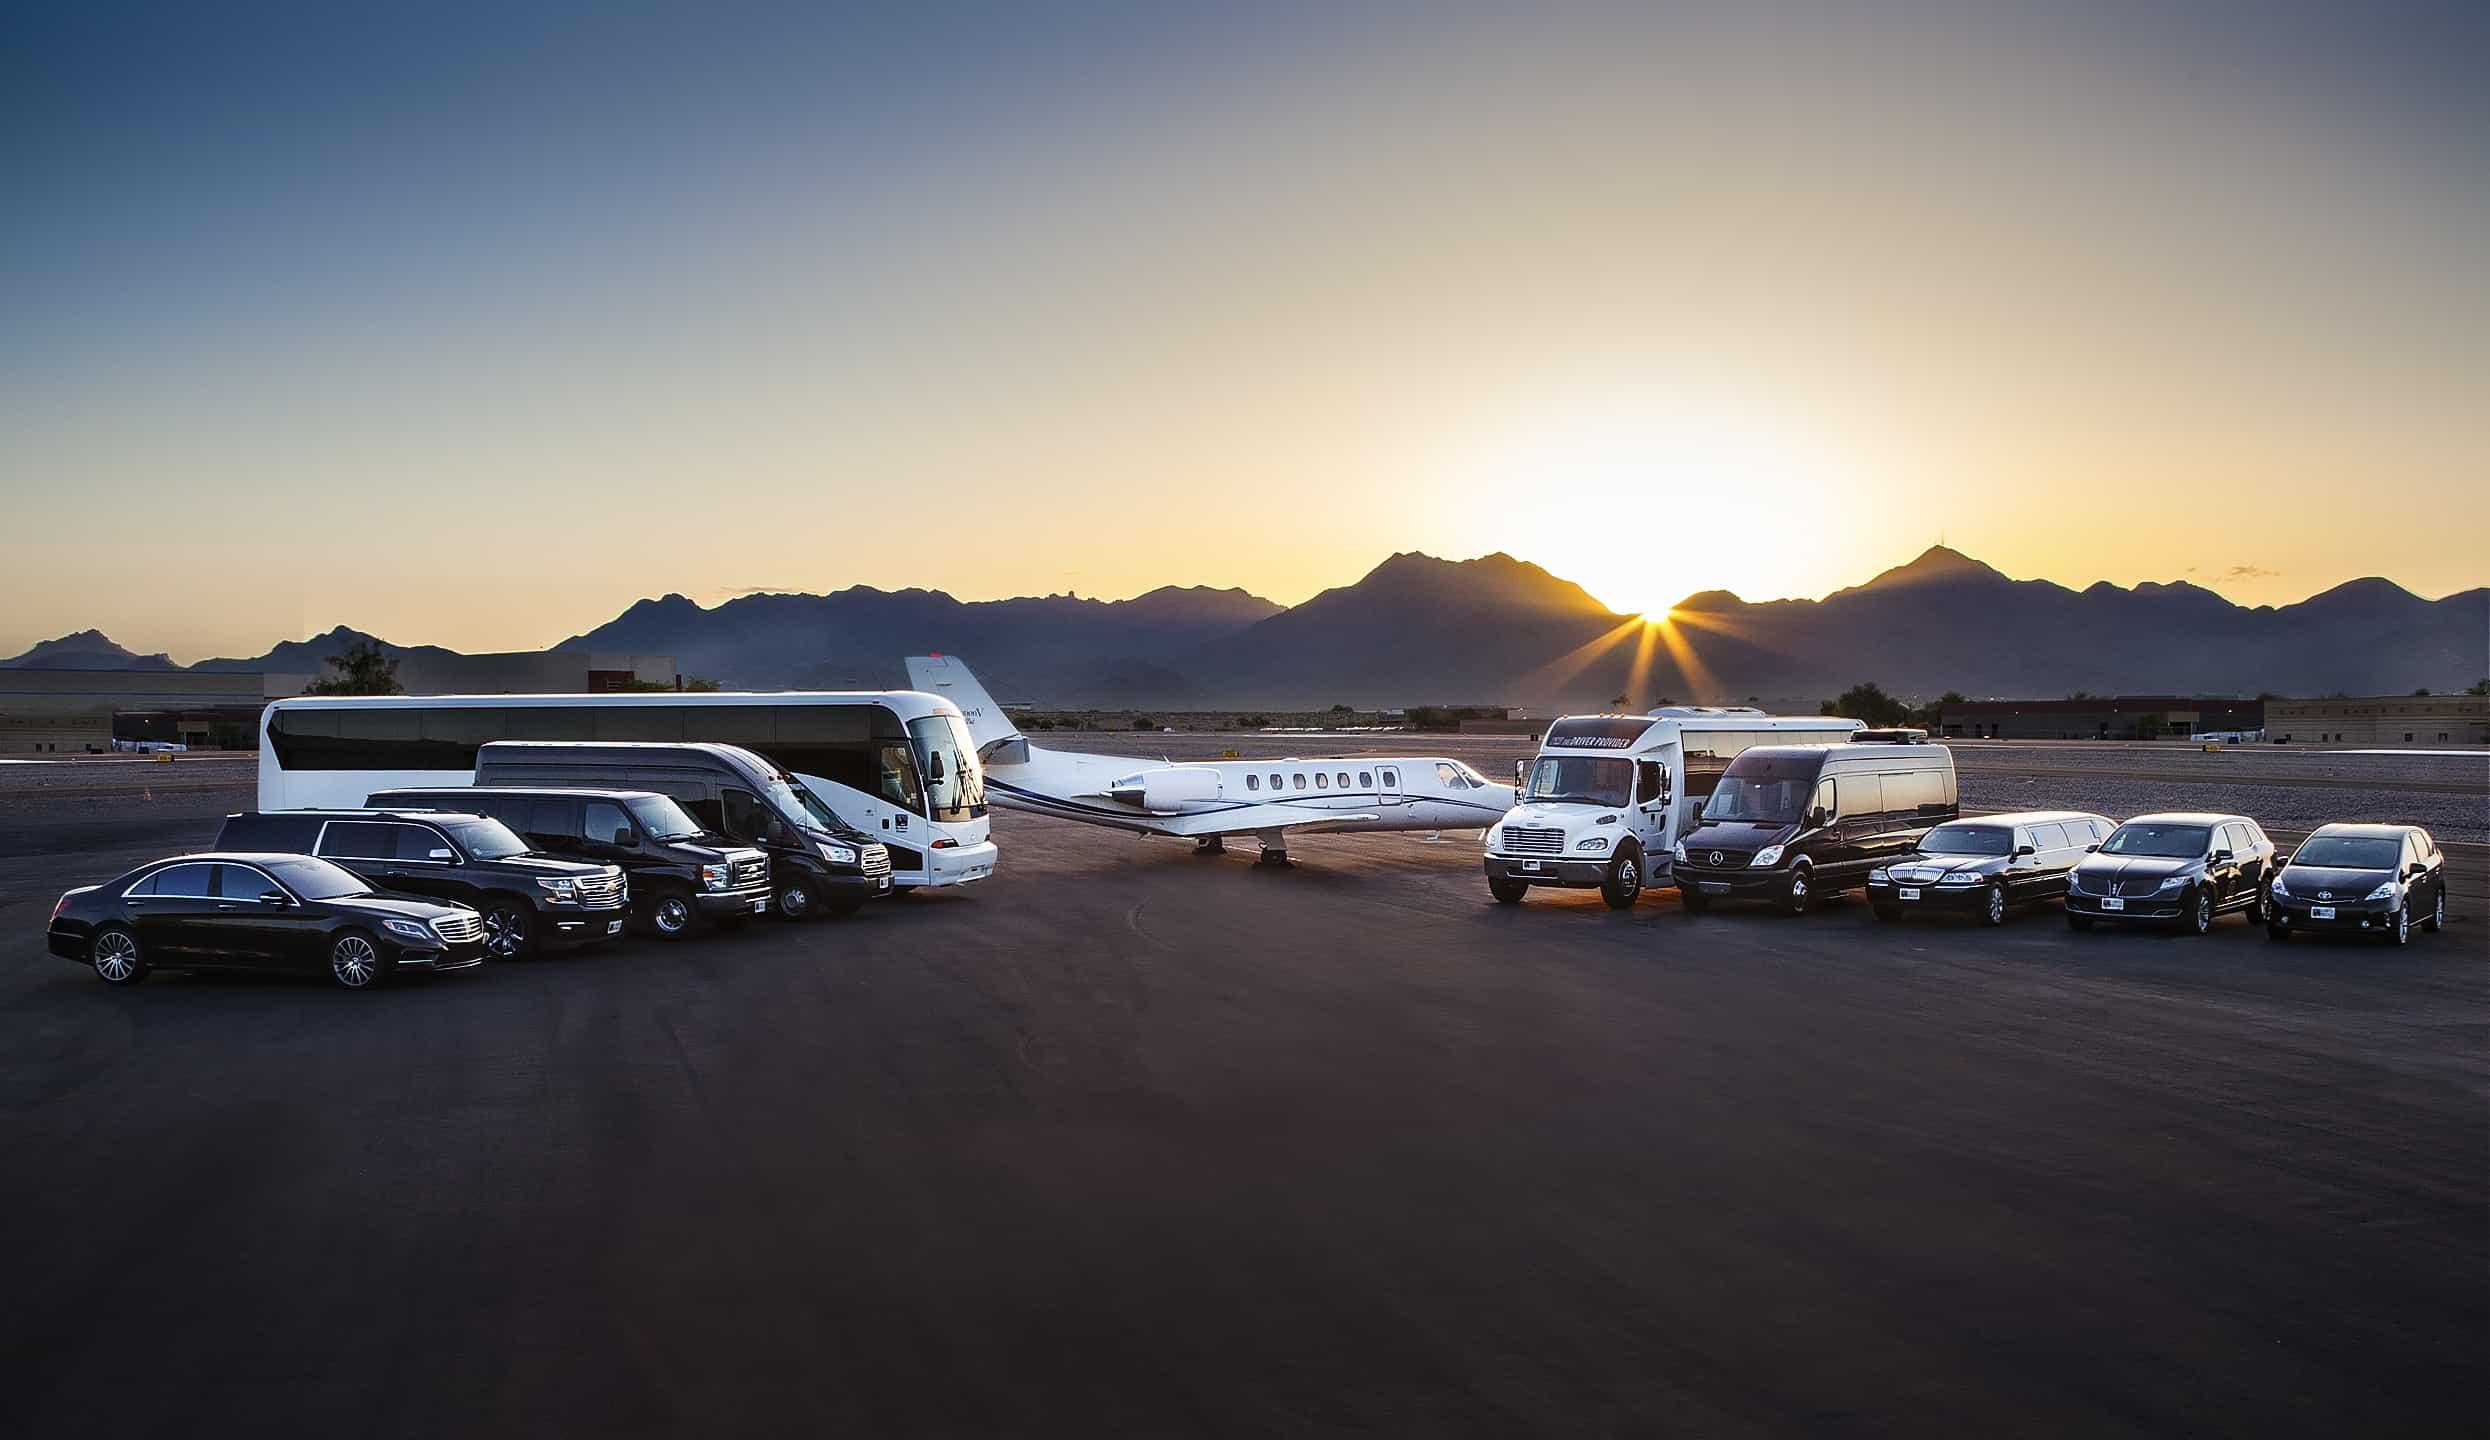 Driver Provider car service fleet